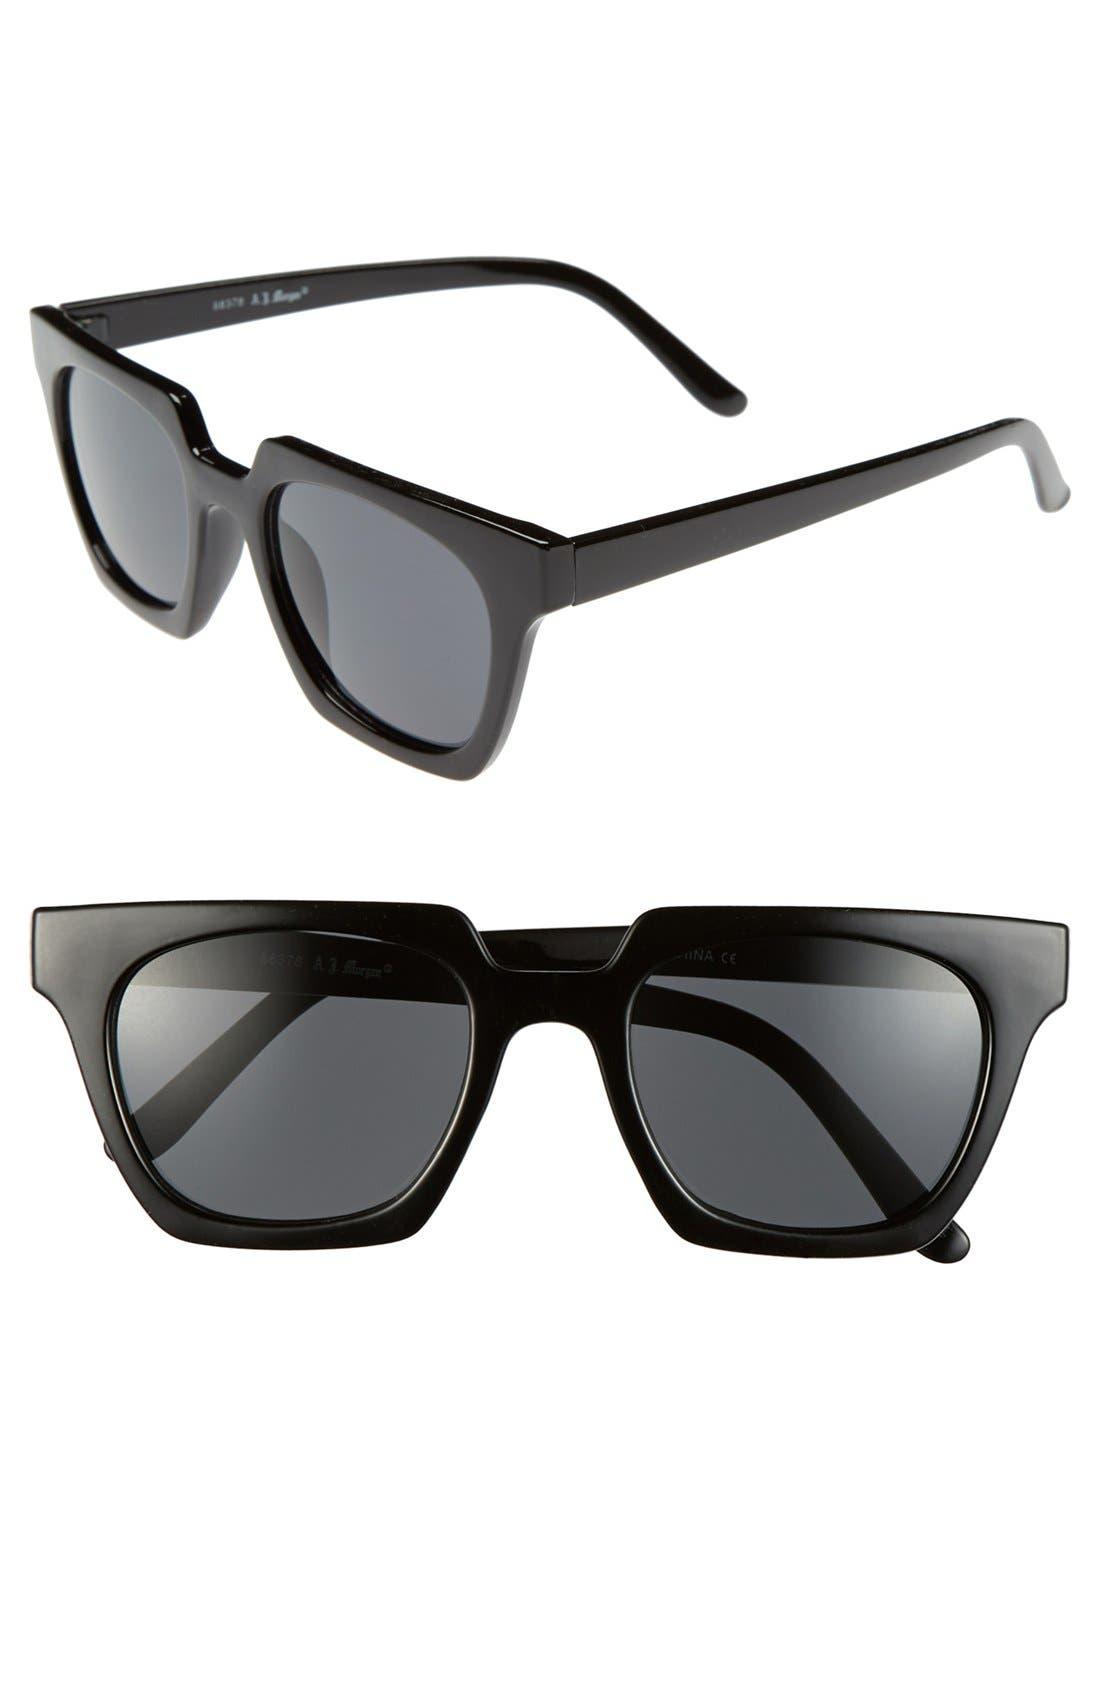 Alternate Image 1 Selected - A.J. Morgan 'Geo' 50mm Sunglasses